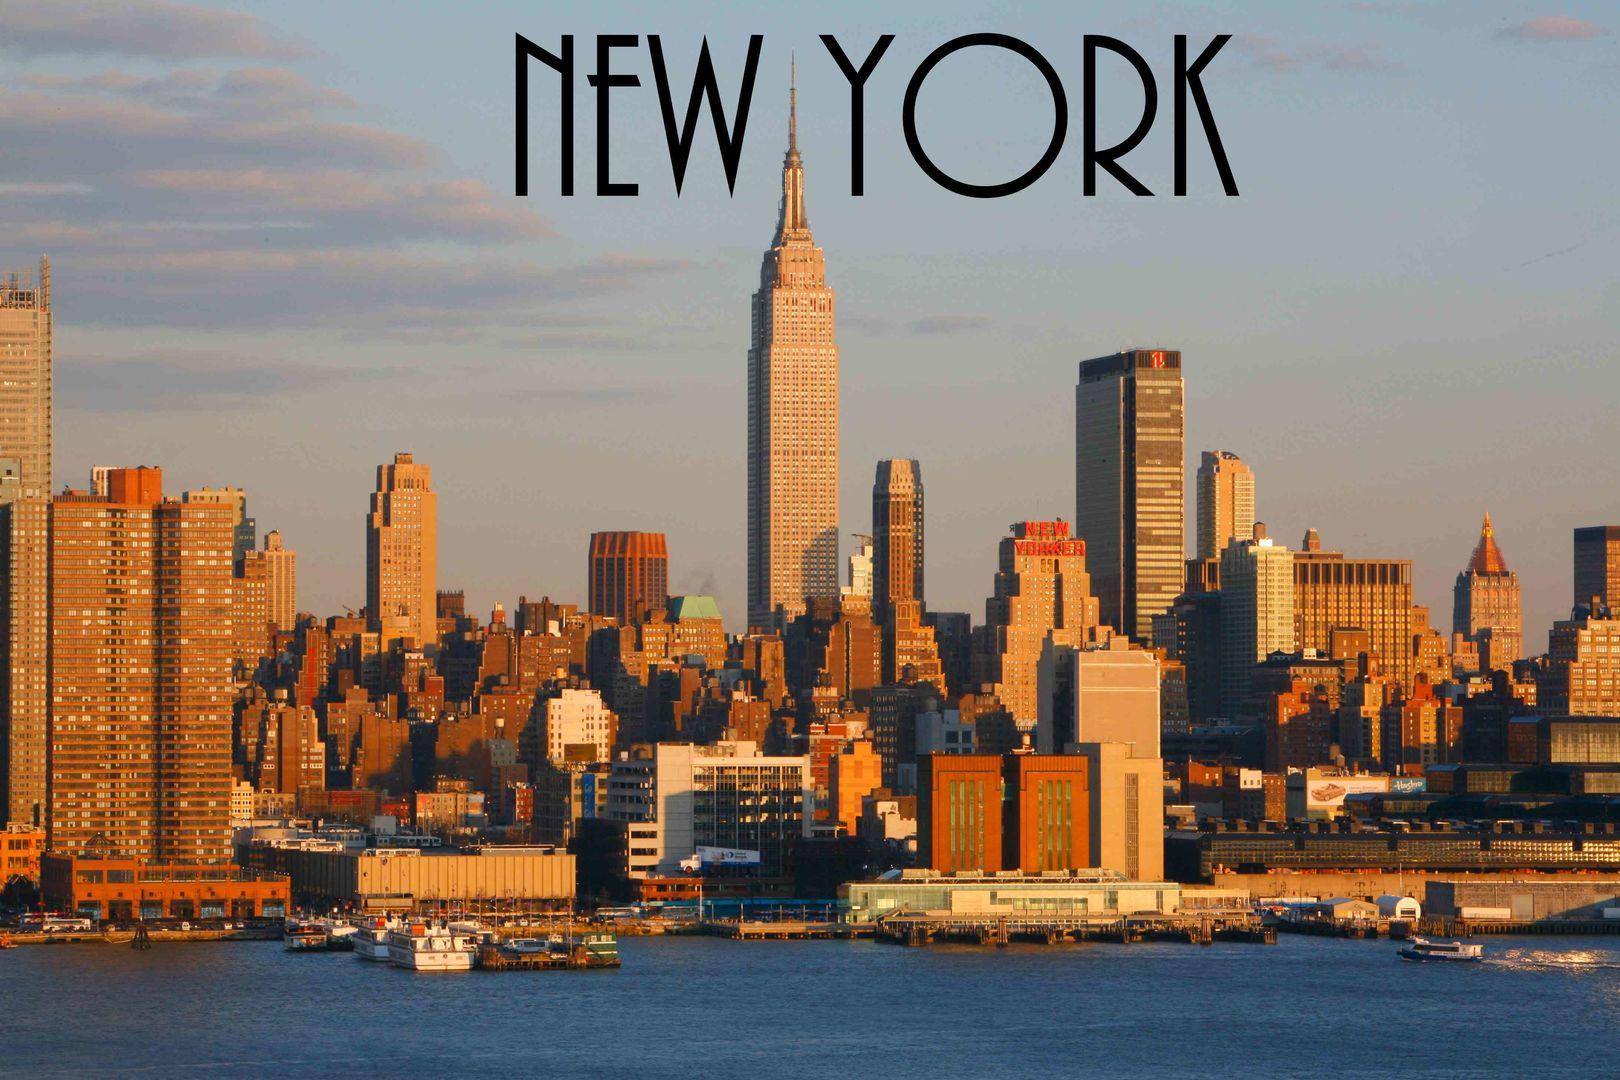 new york flight tickets from london